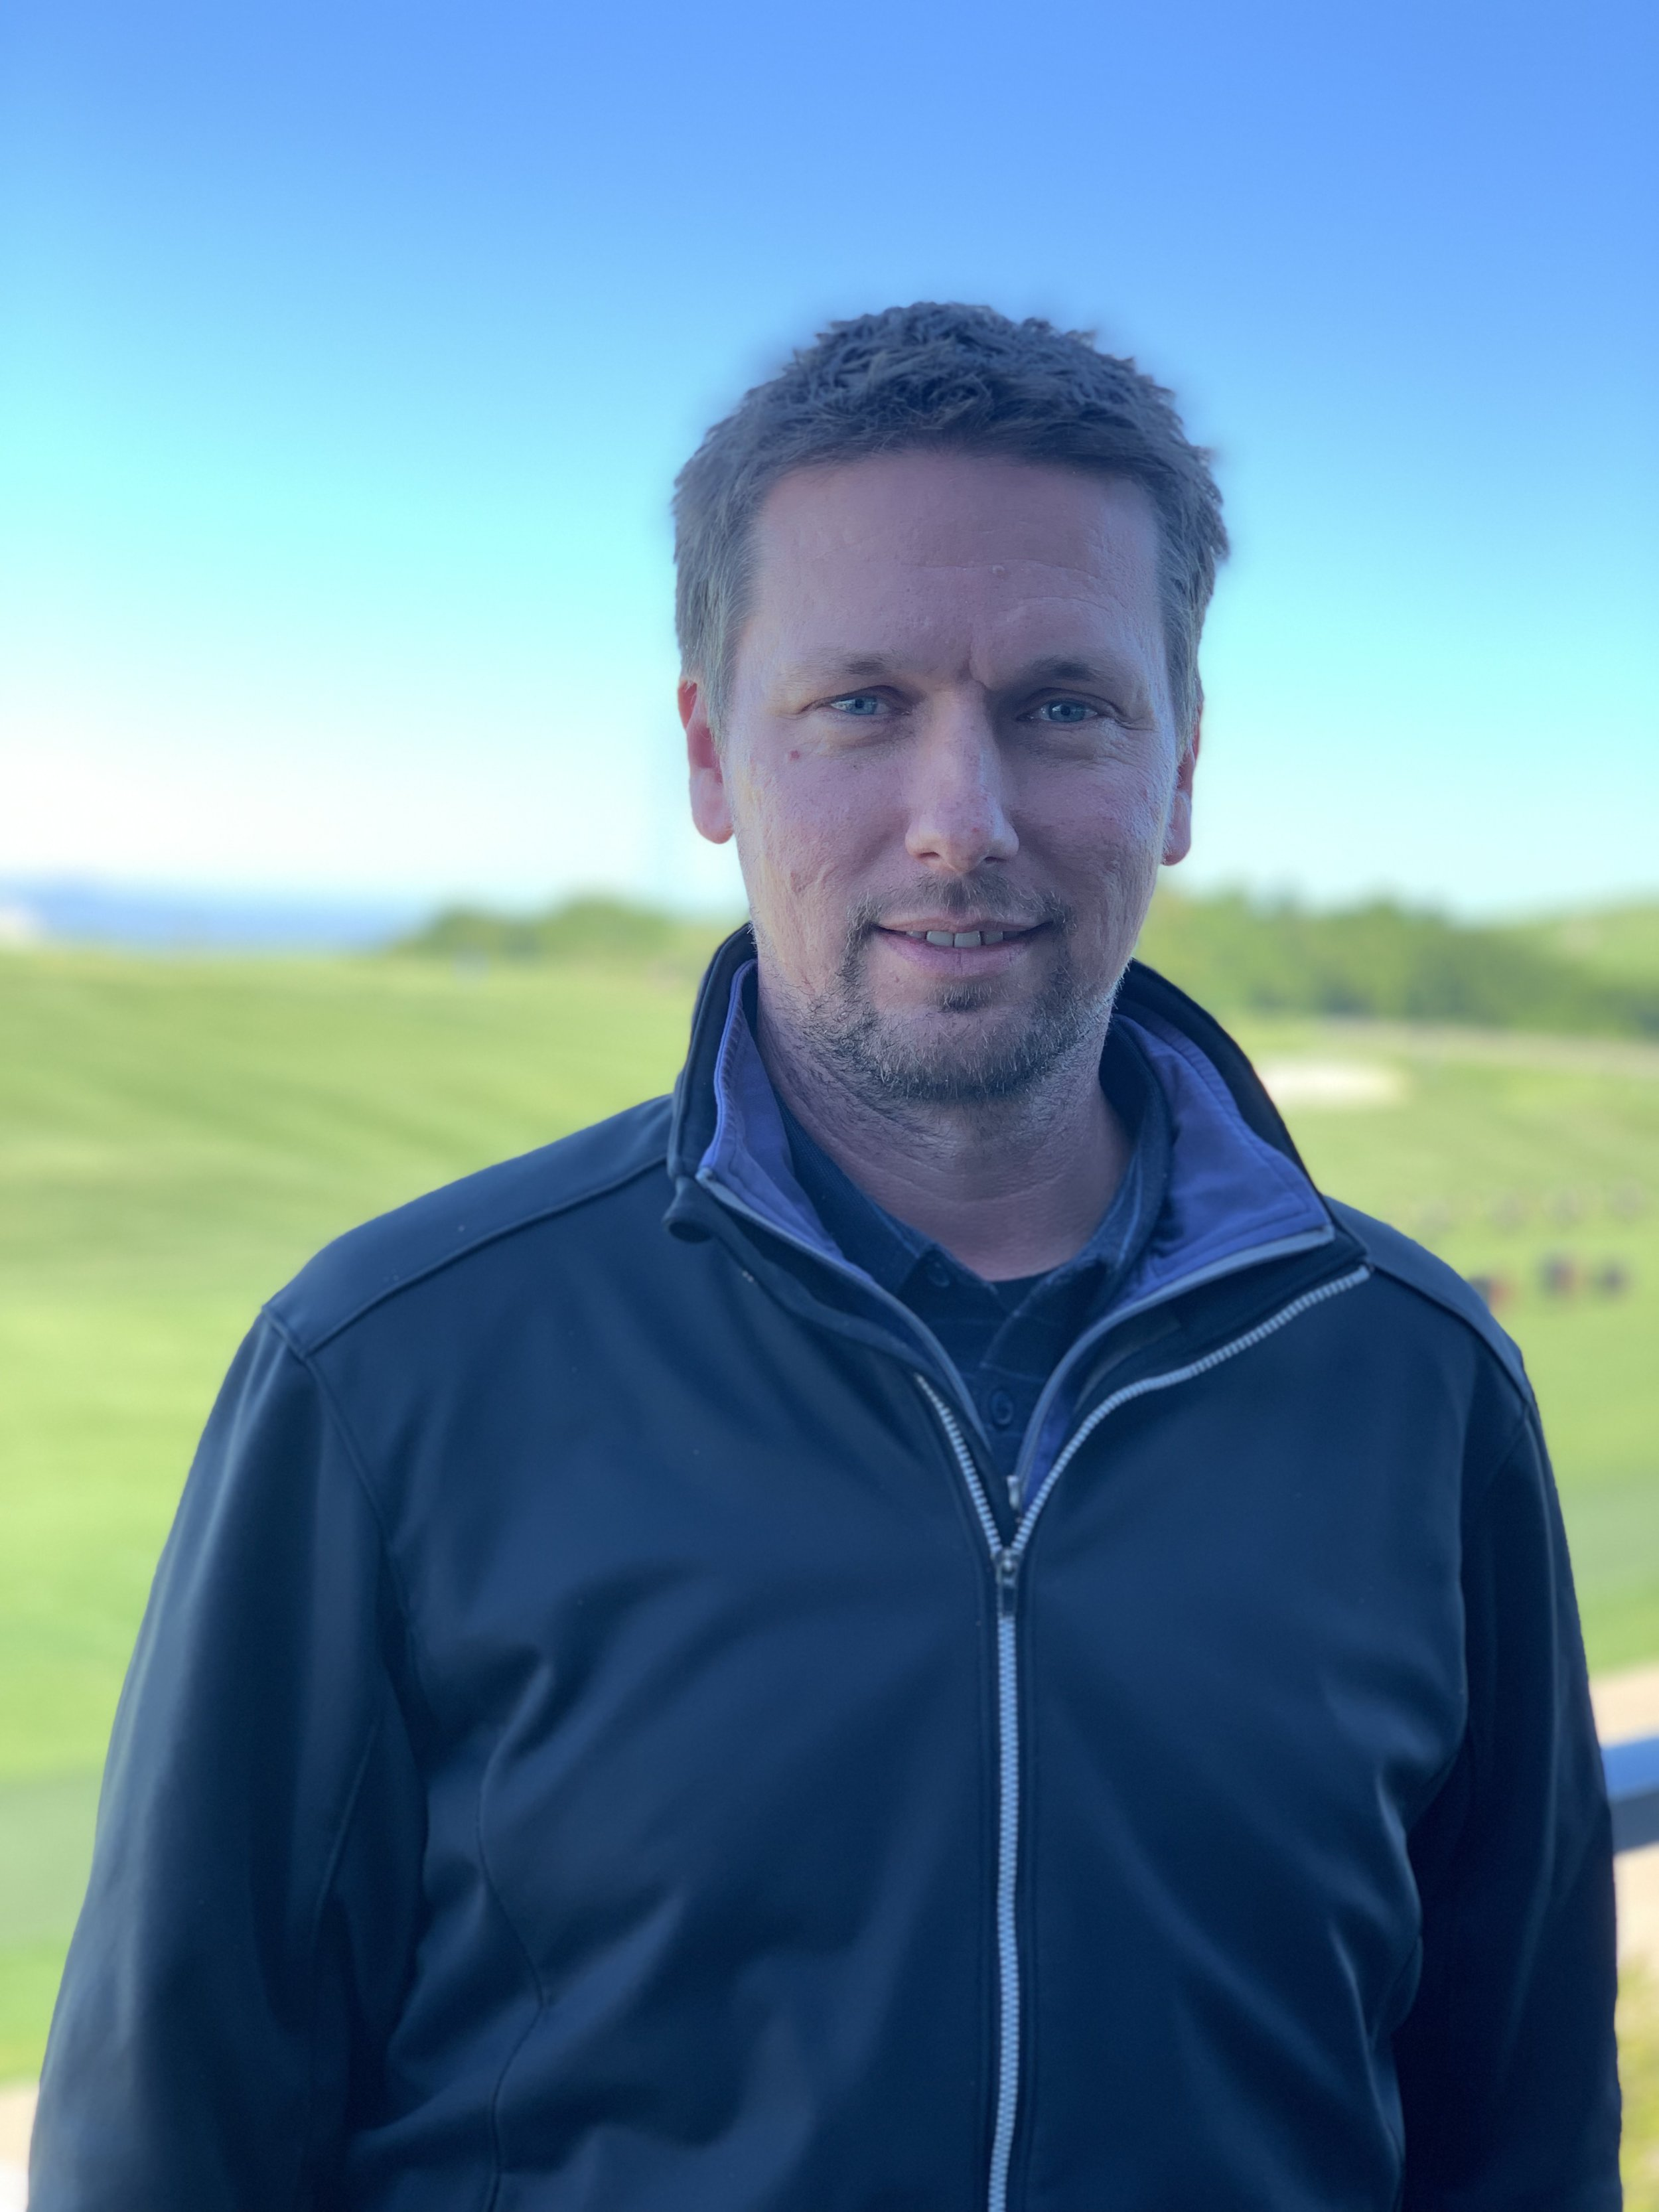 John Majchrzak - Golf Course Superintendent    jmajchrzak@stonebrae.com    510.690.9437